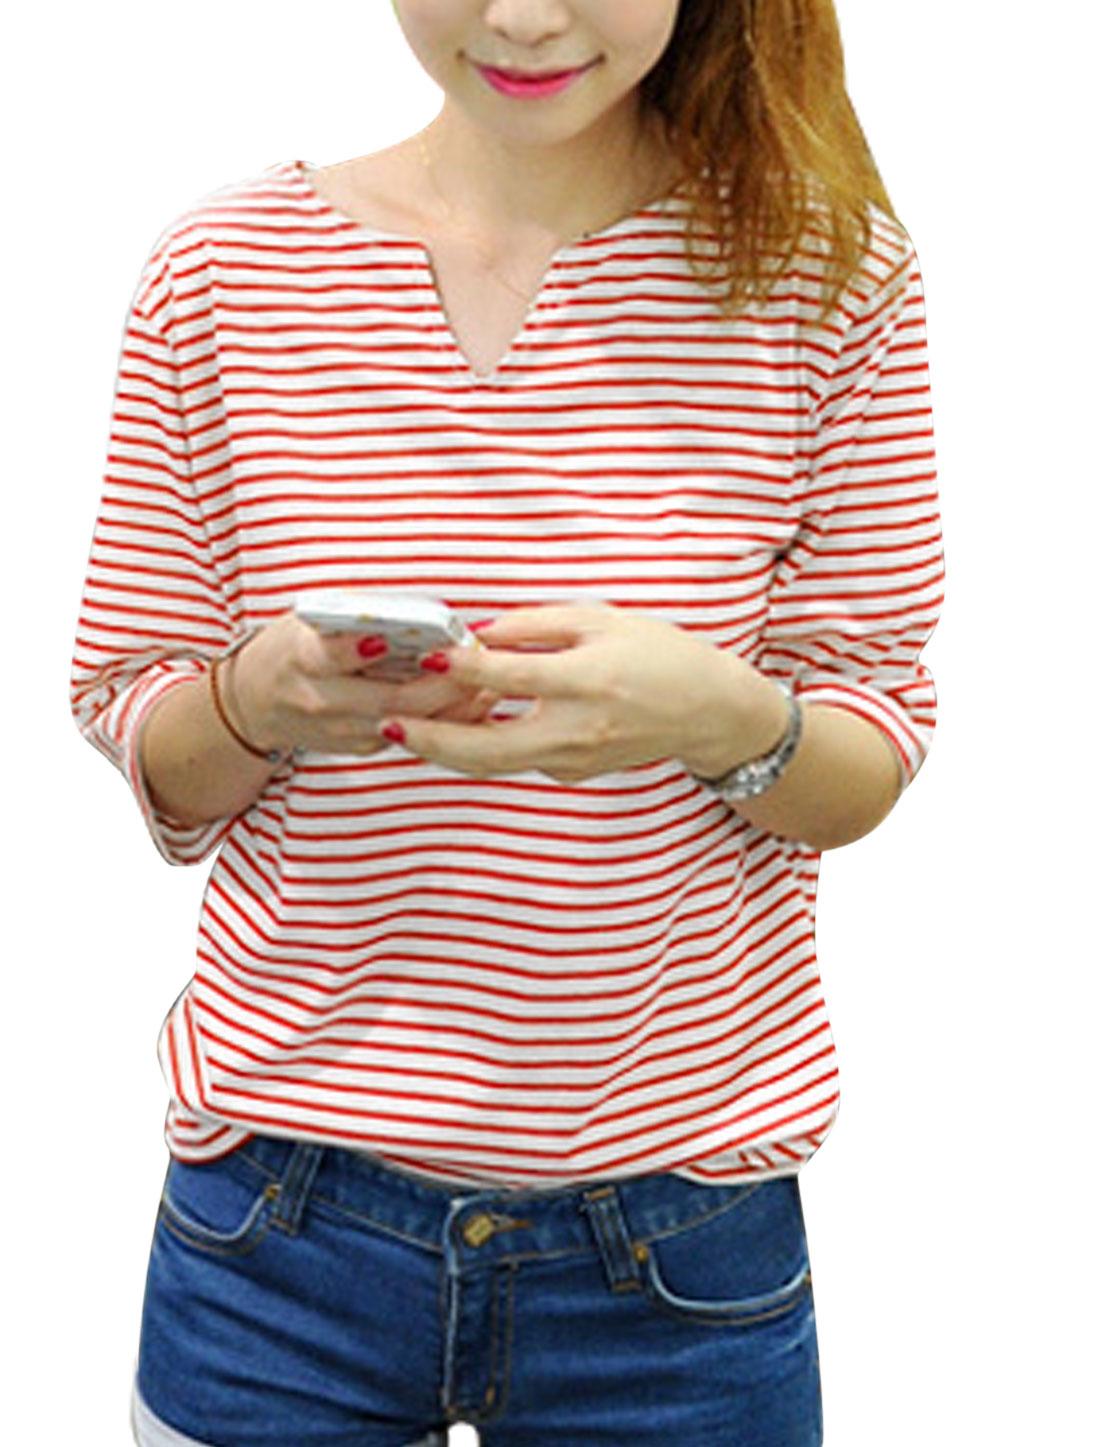 Woman Stripes Split Neck Half Length Sleeves Slipover Leisure Top Red White XS